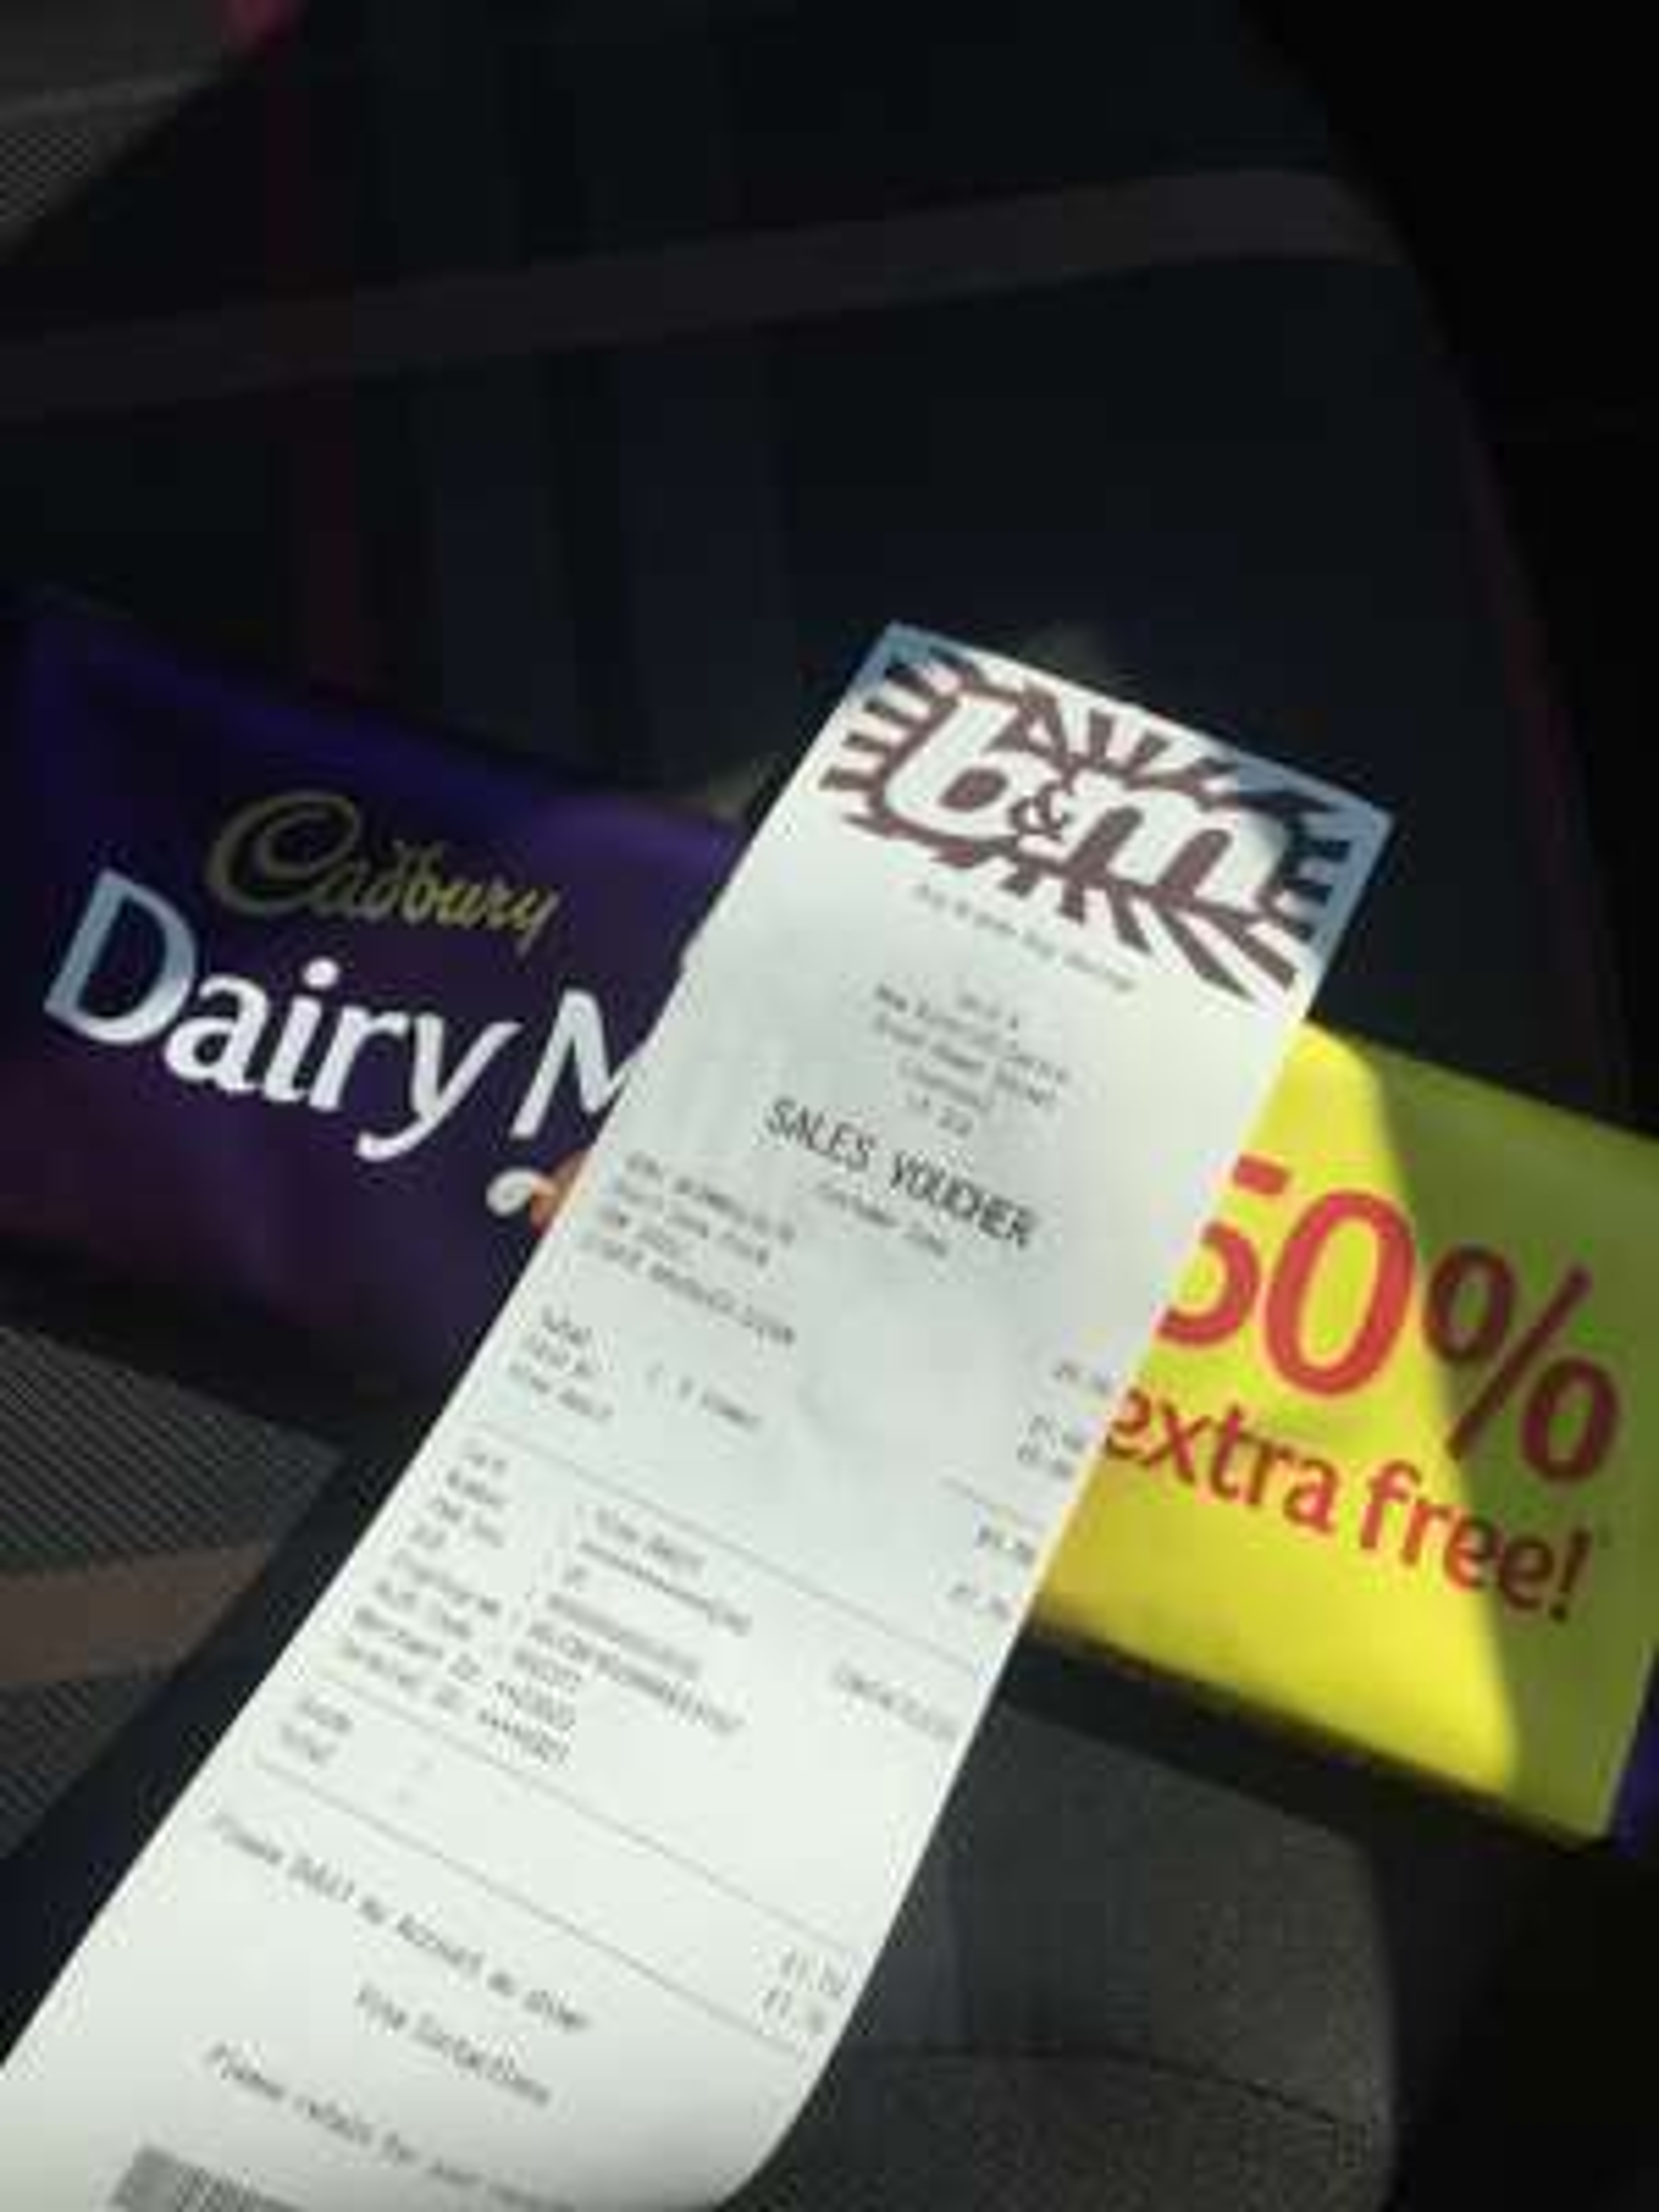 Cadbury's Dairy Milk 300G Large bar only £1 @ B&M Instore